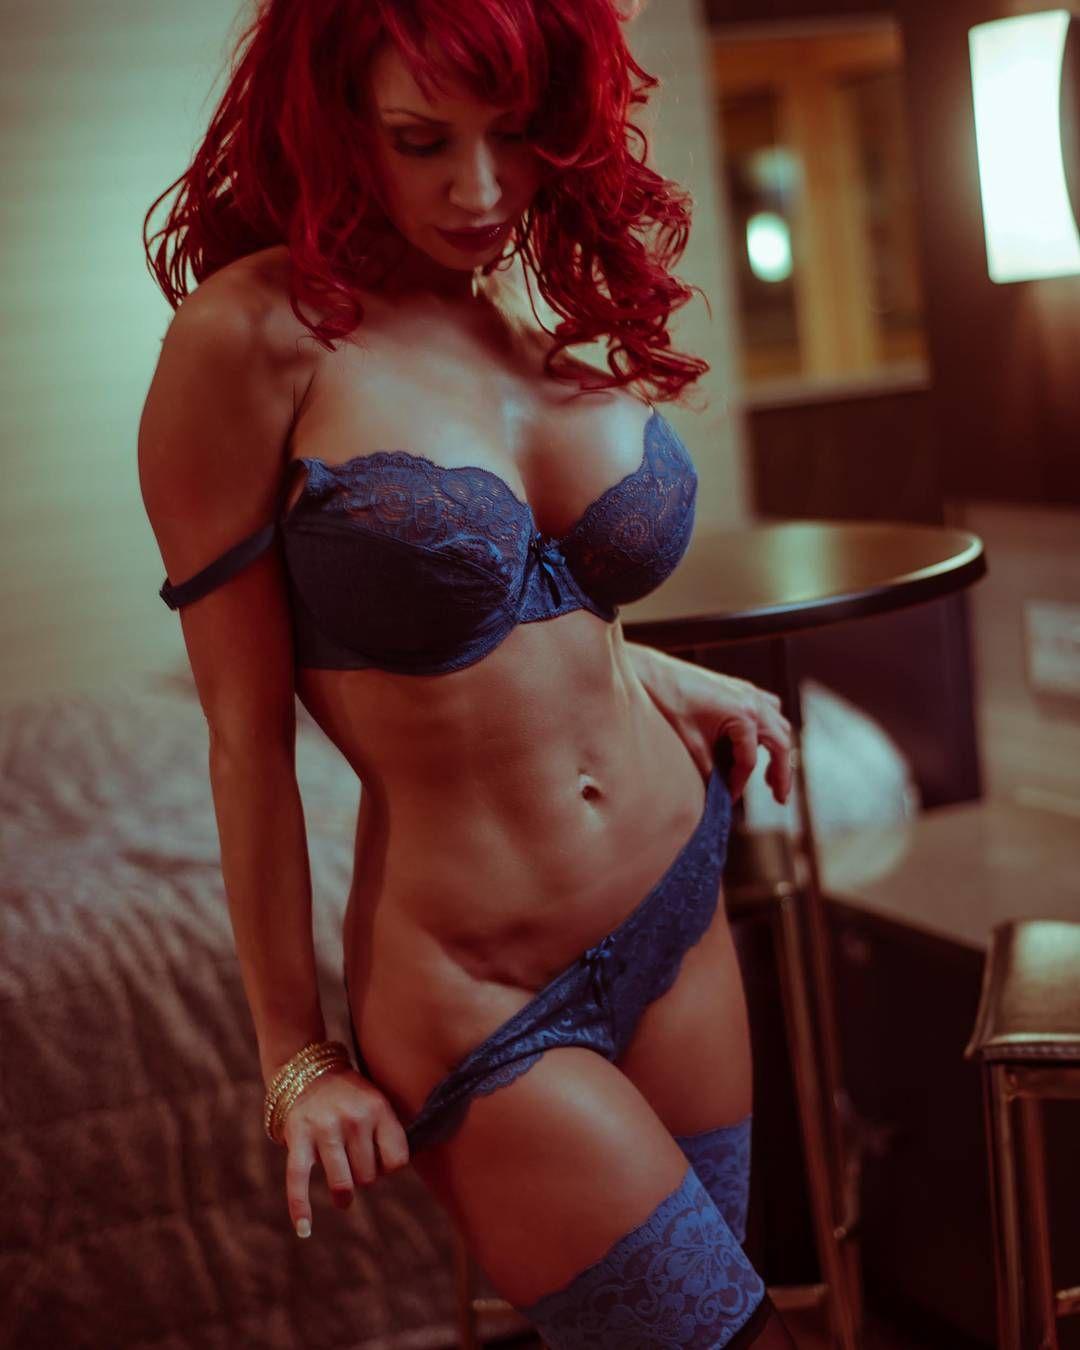 Chubby Red Head Porn